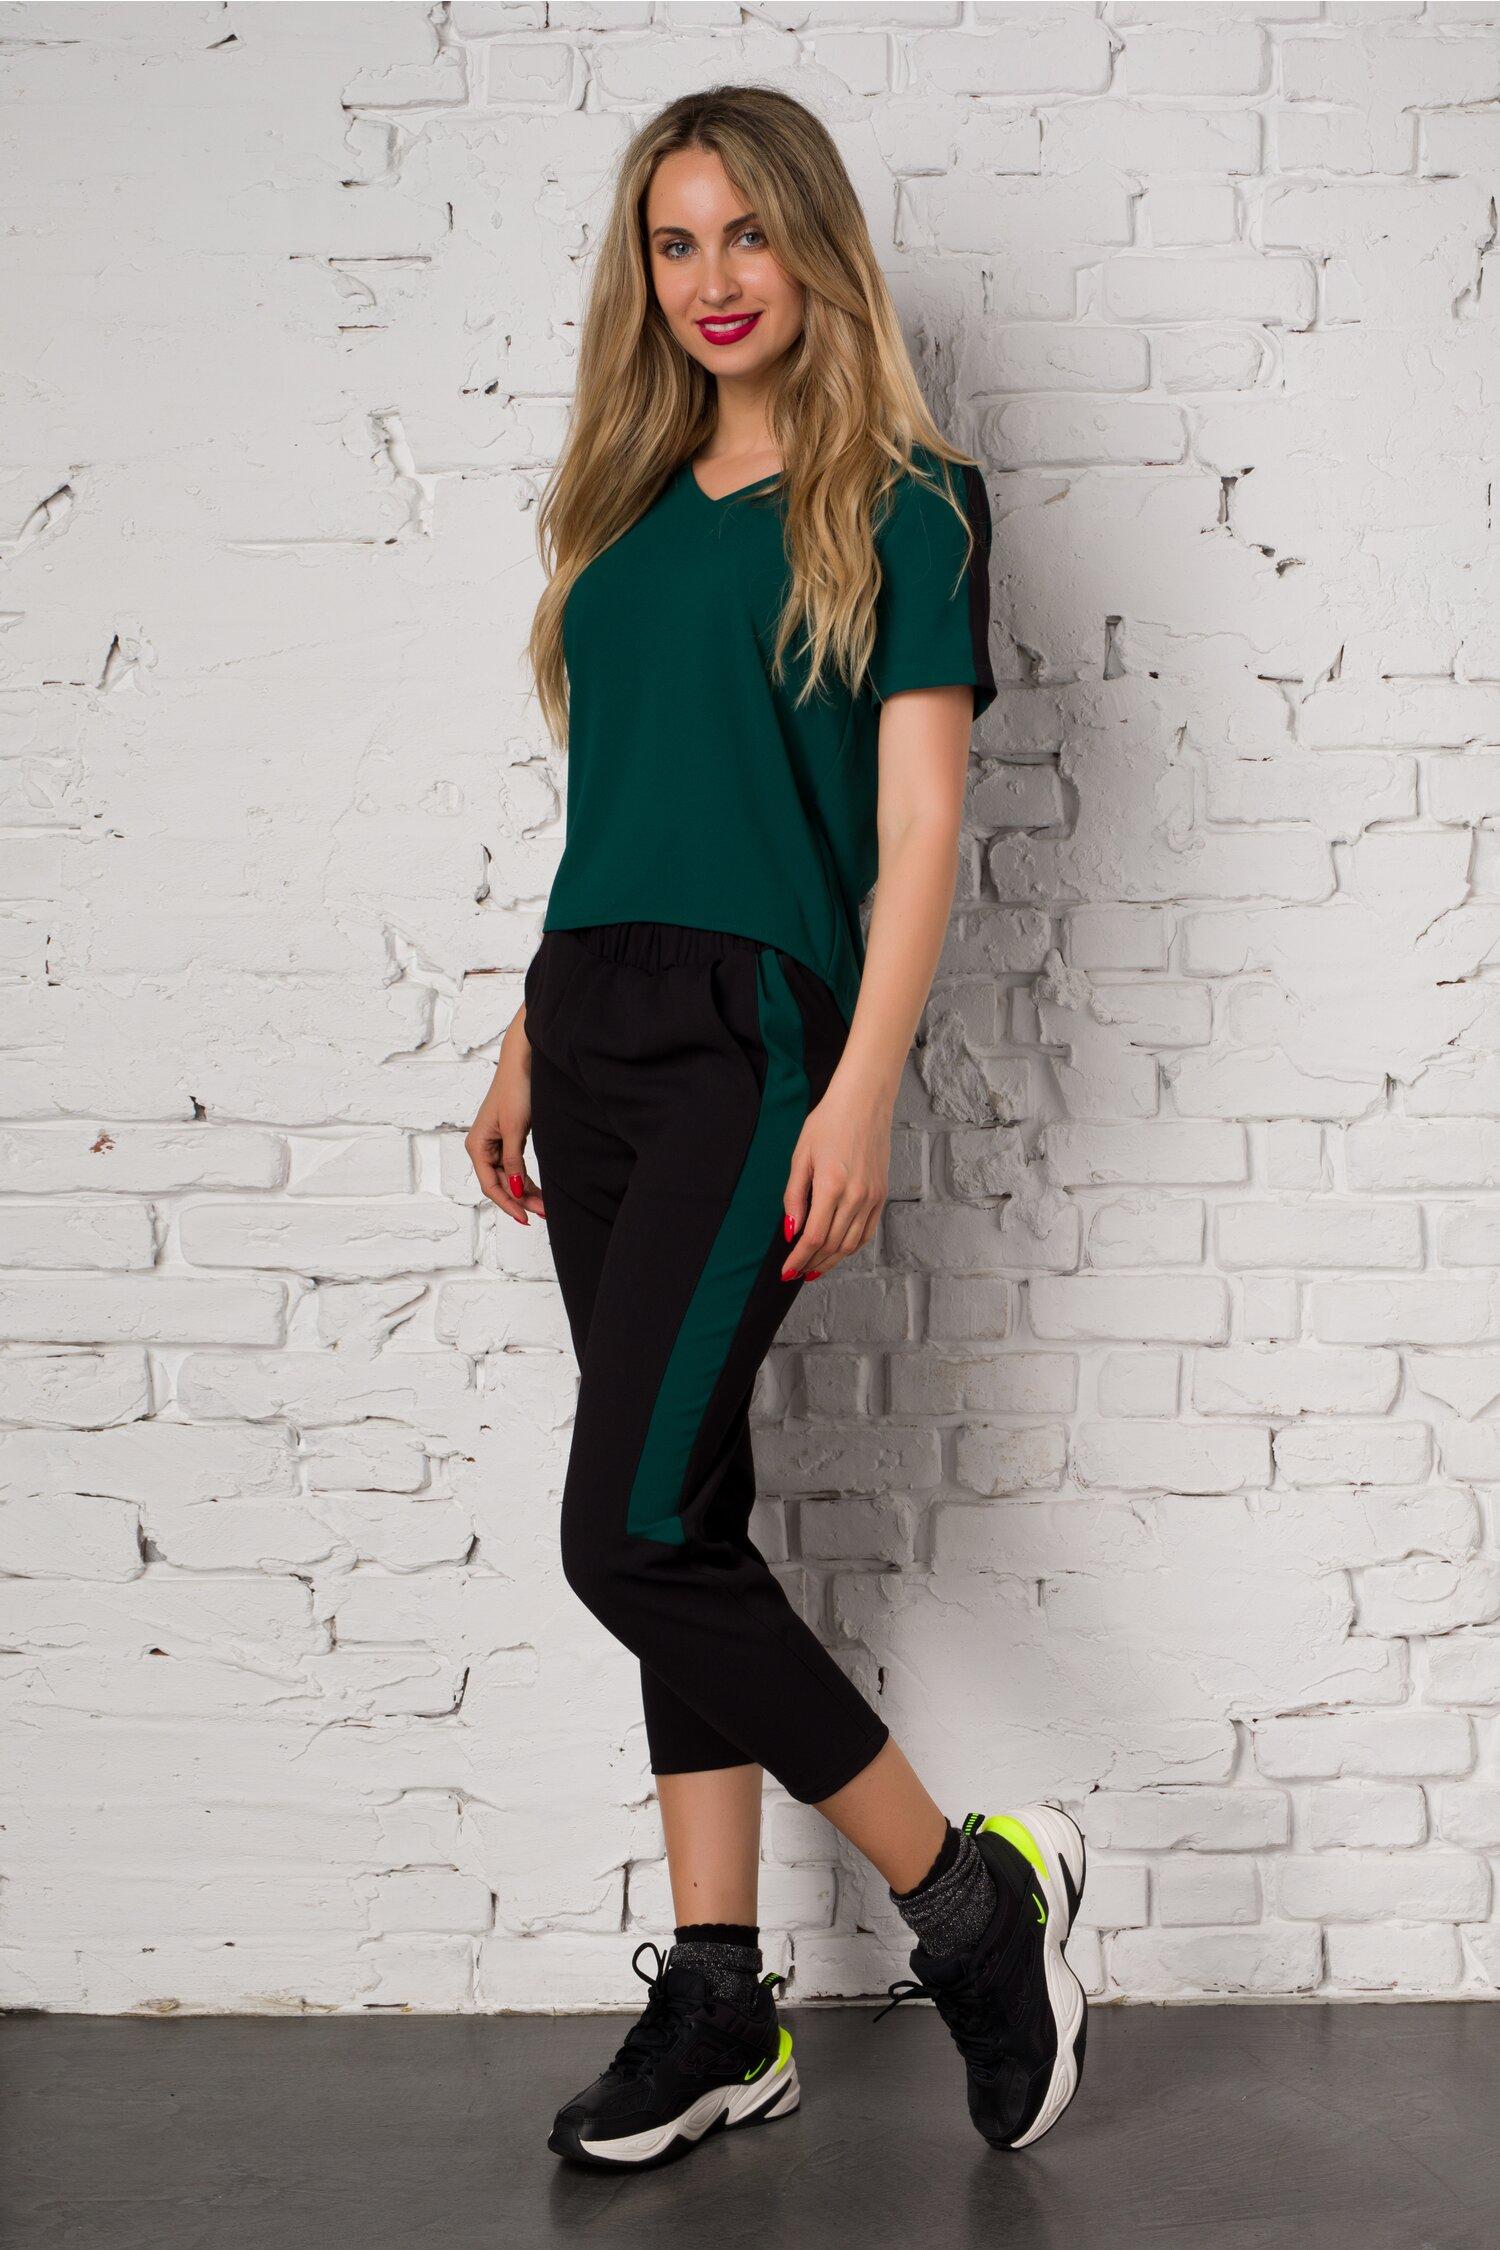 Compleu Ella Collection Valeria cu top verde si pantaloni negri